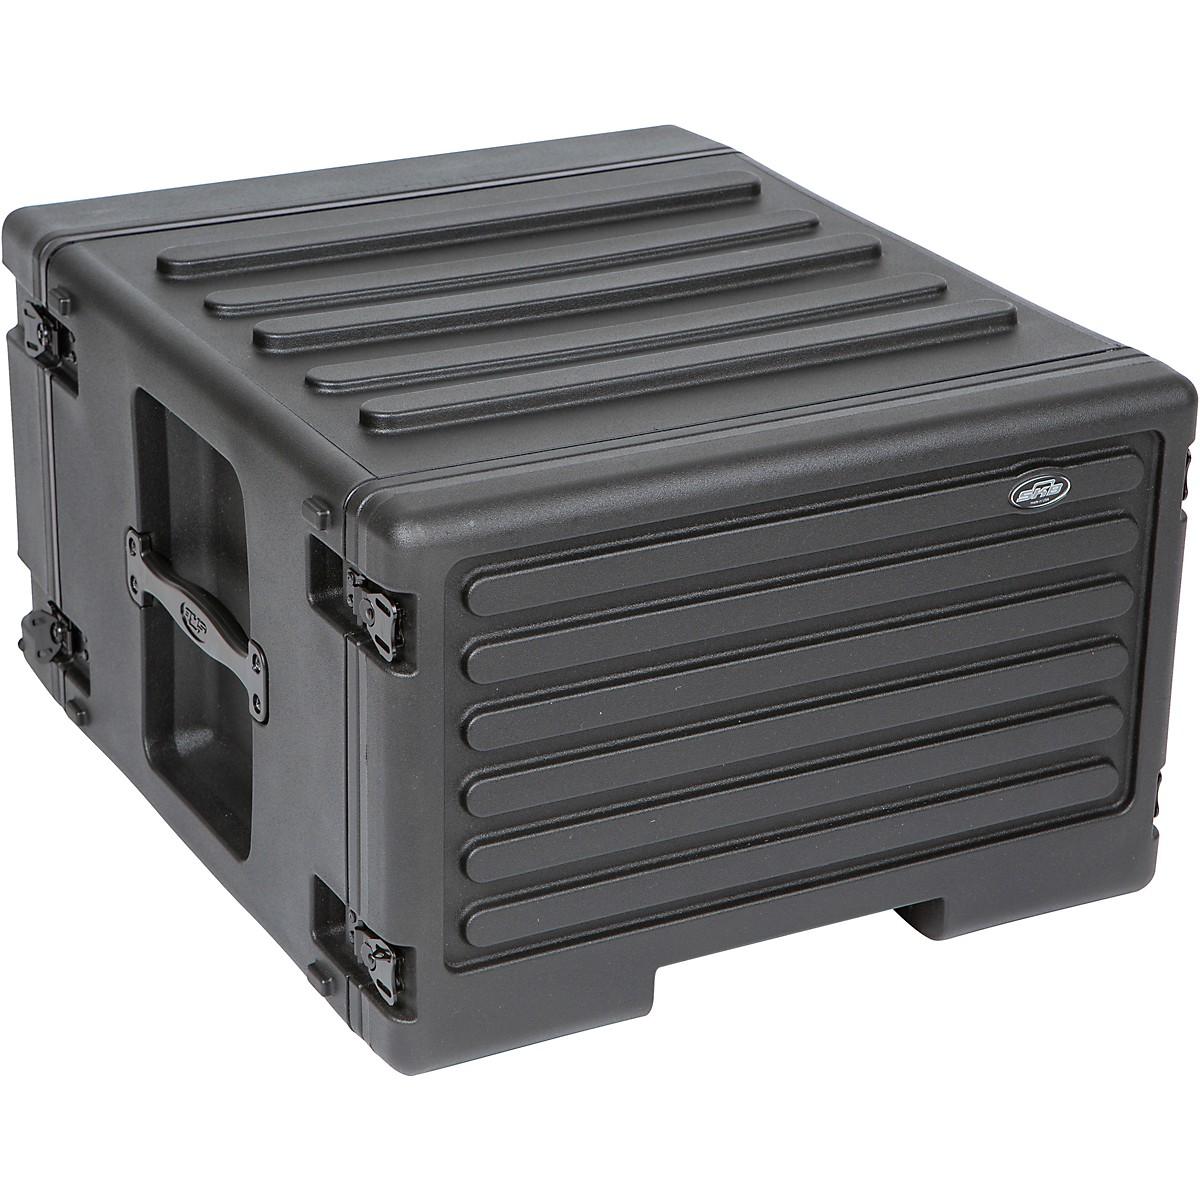 SKB 1SKB-R6UW 6U Rolling Roto Rack Case